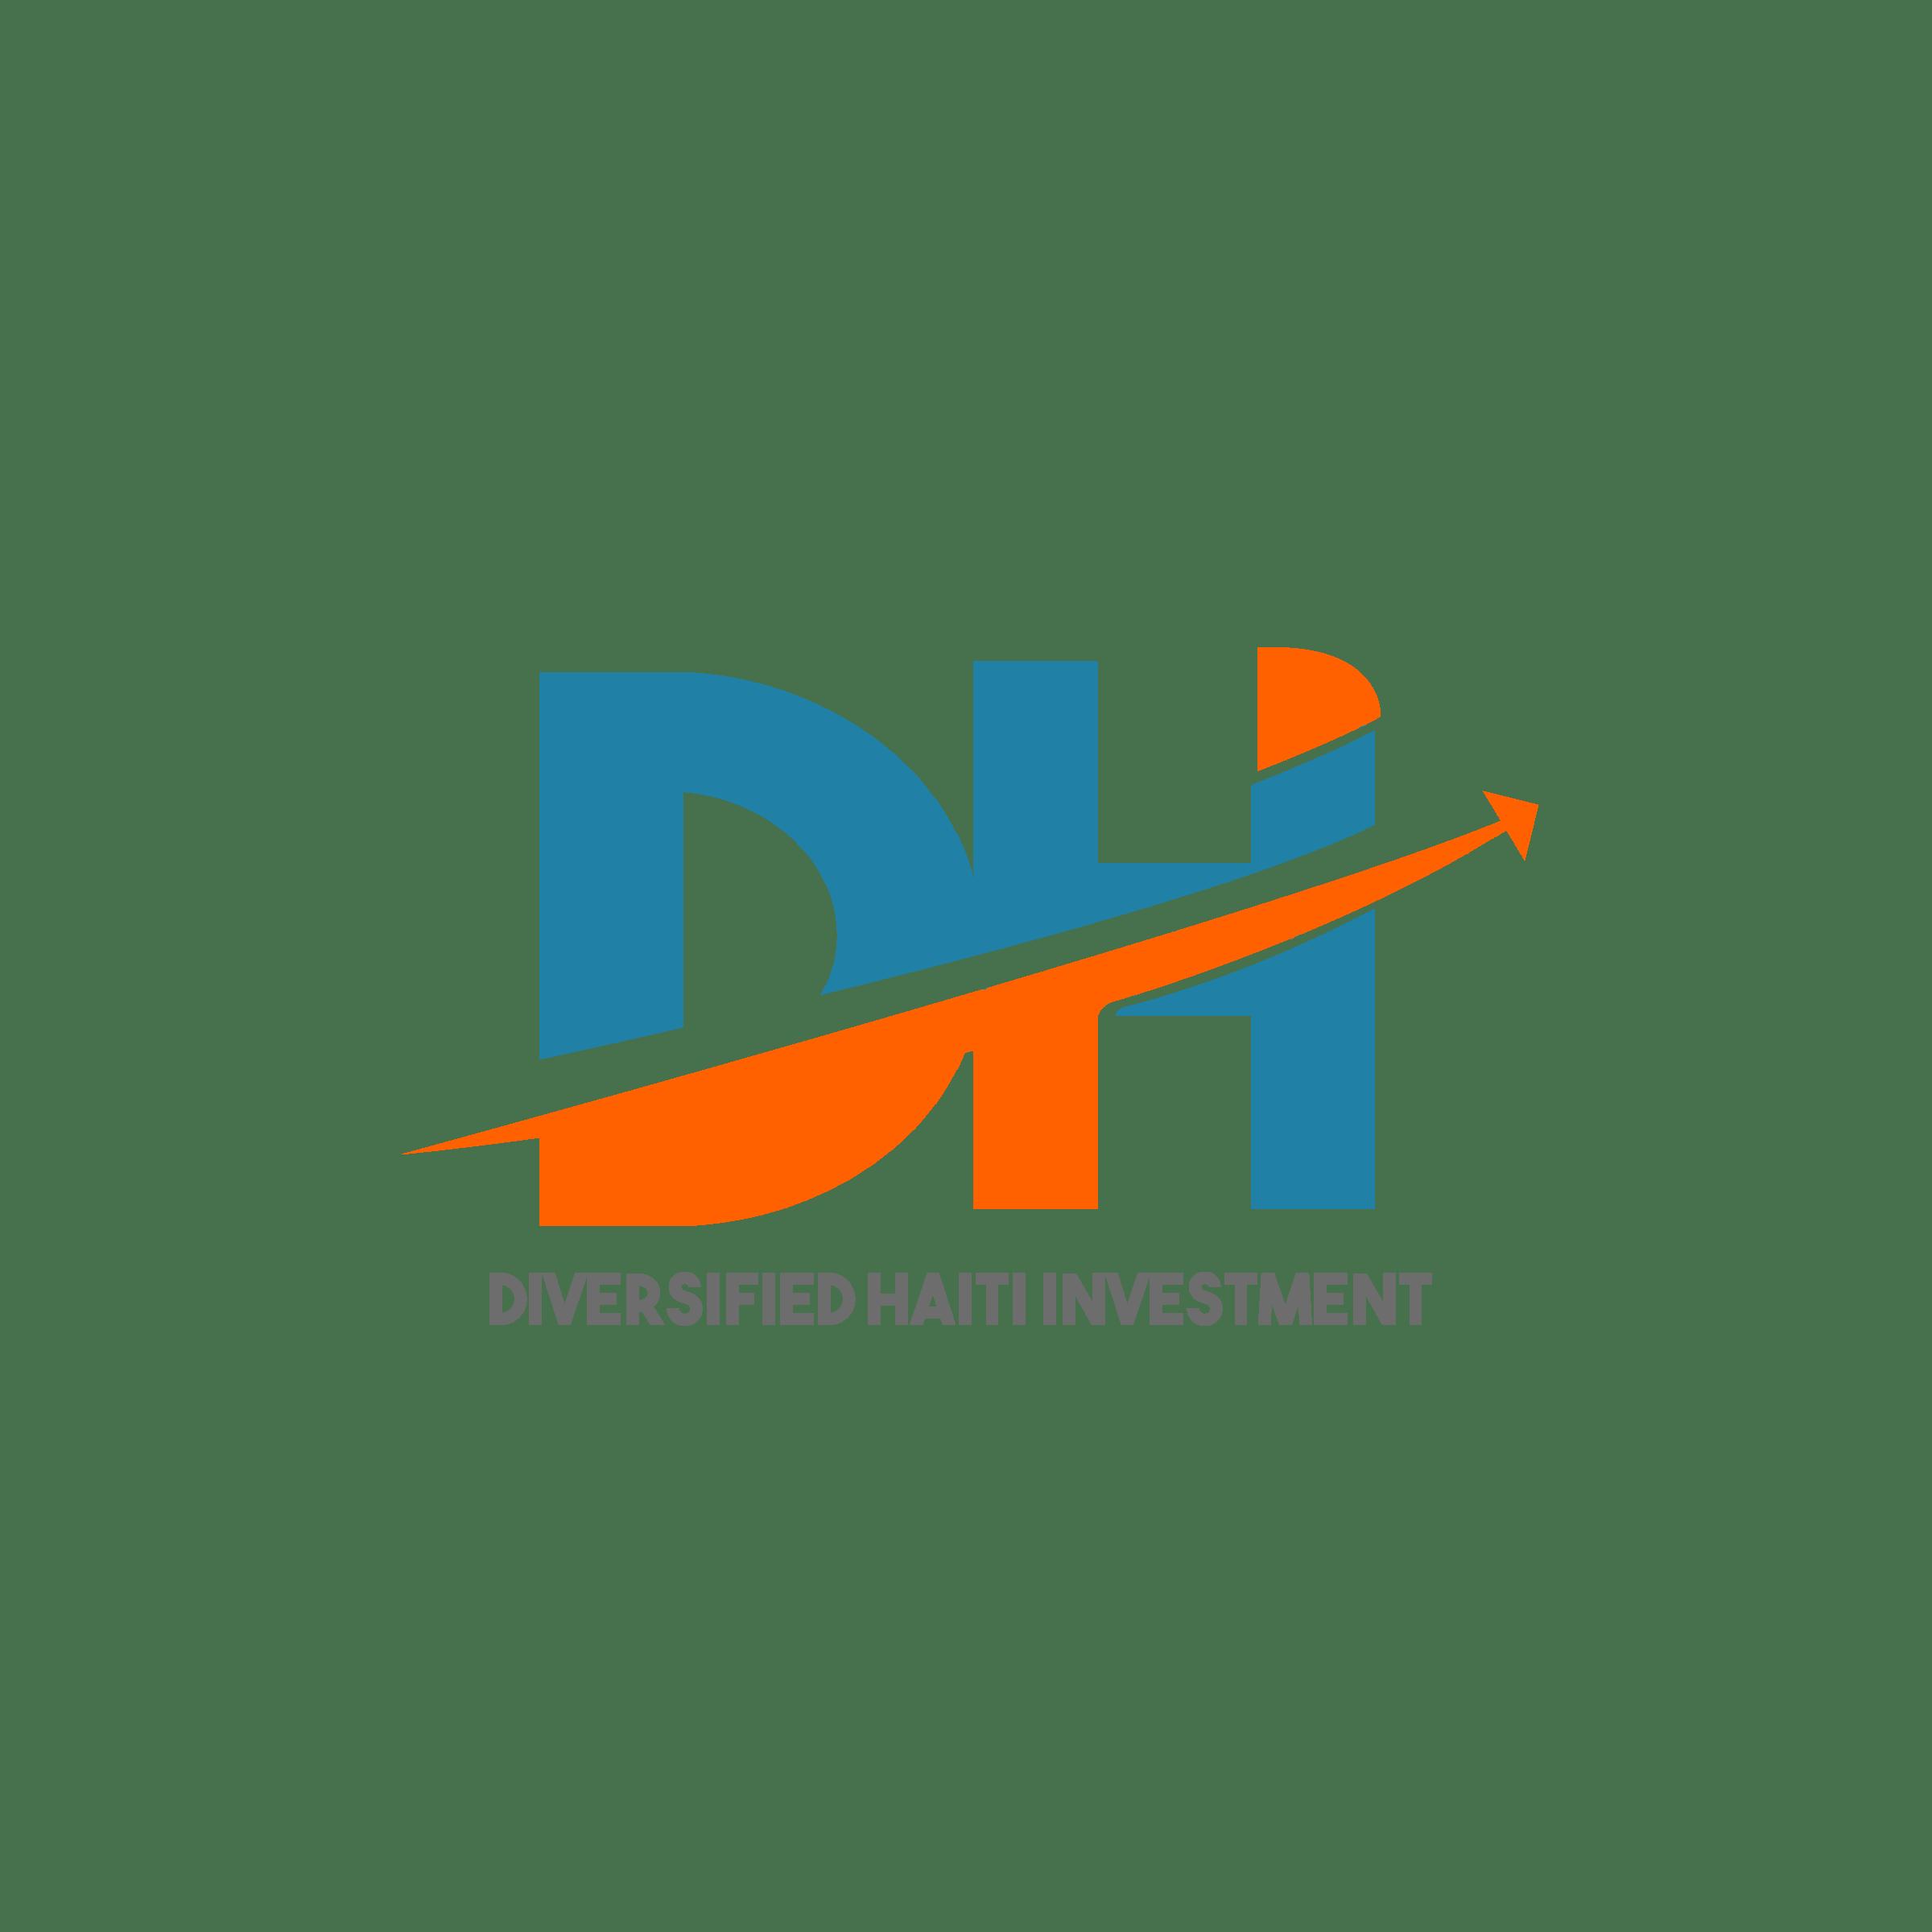 Geek Digital Client DHI